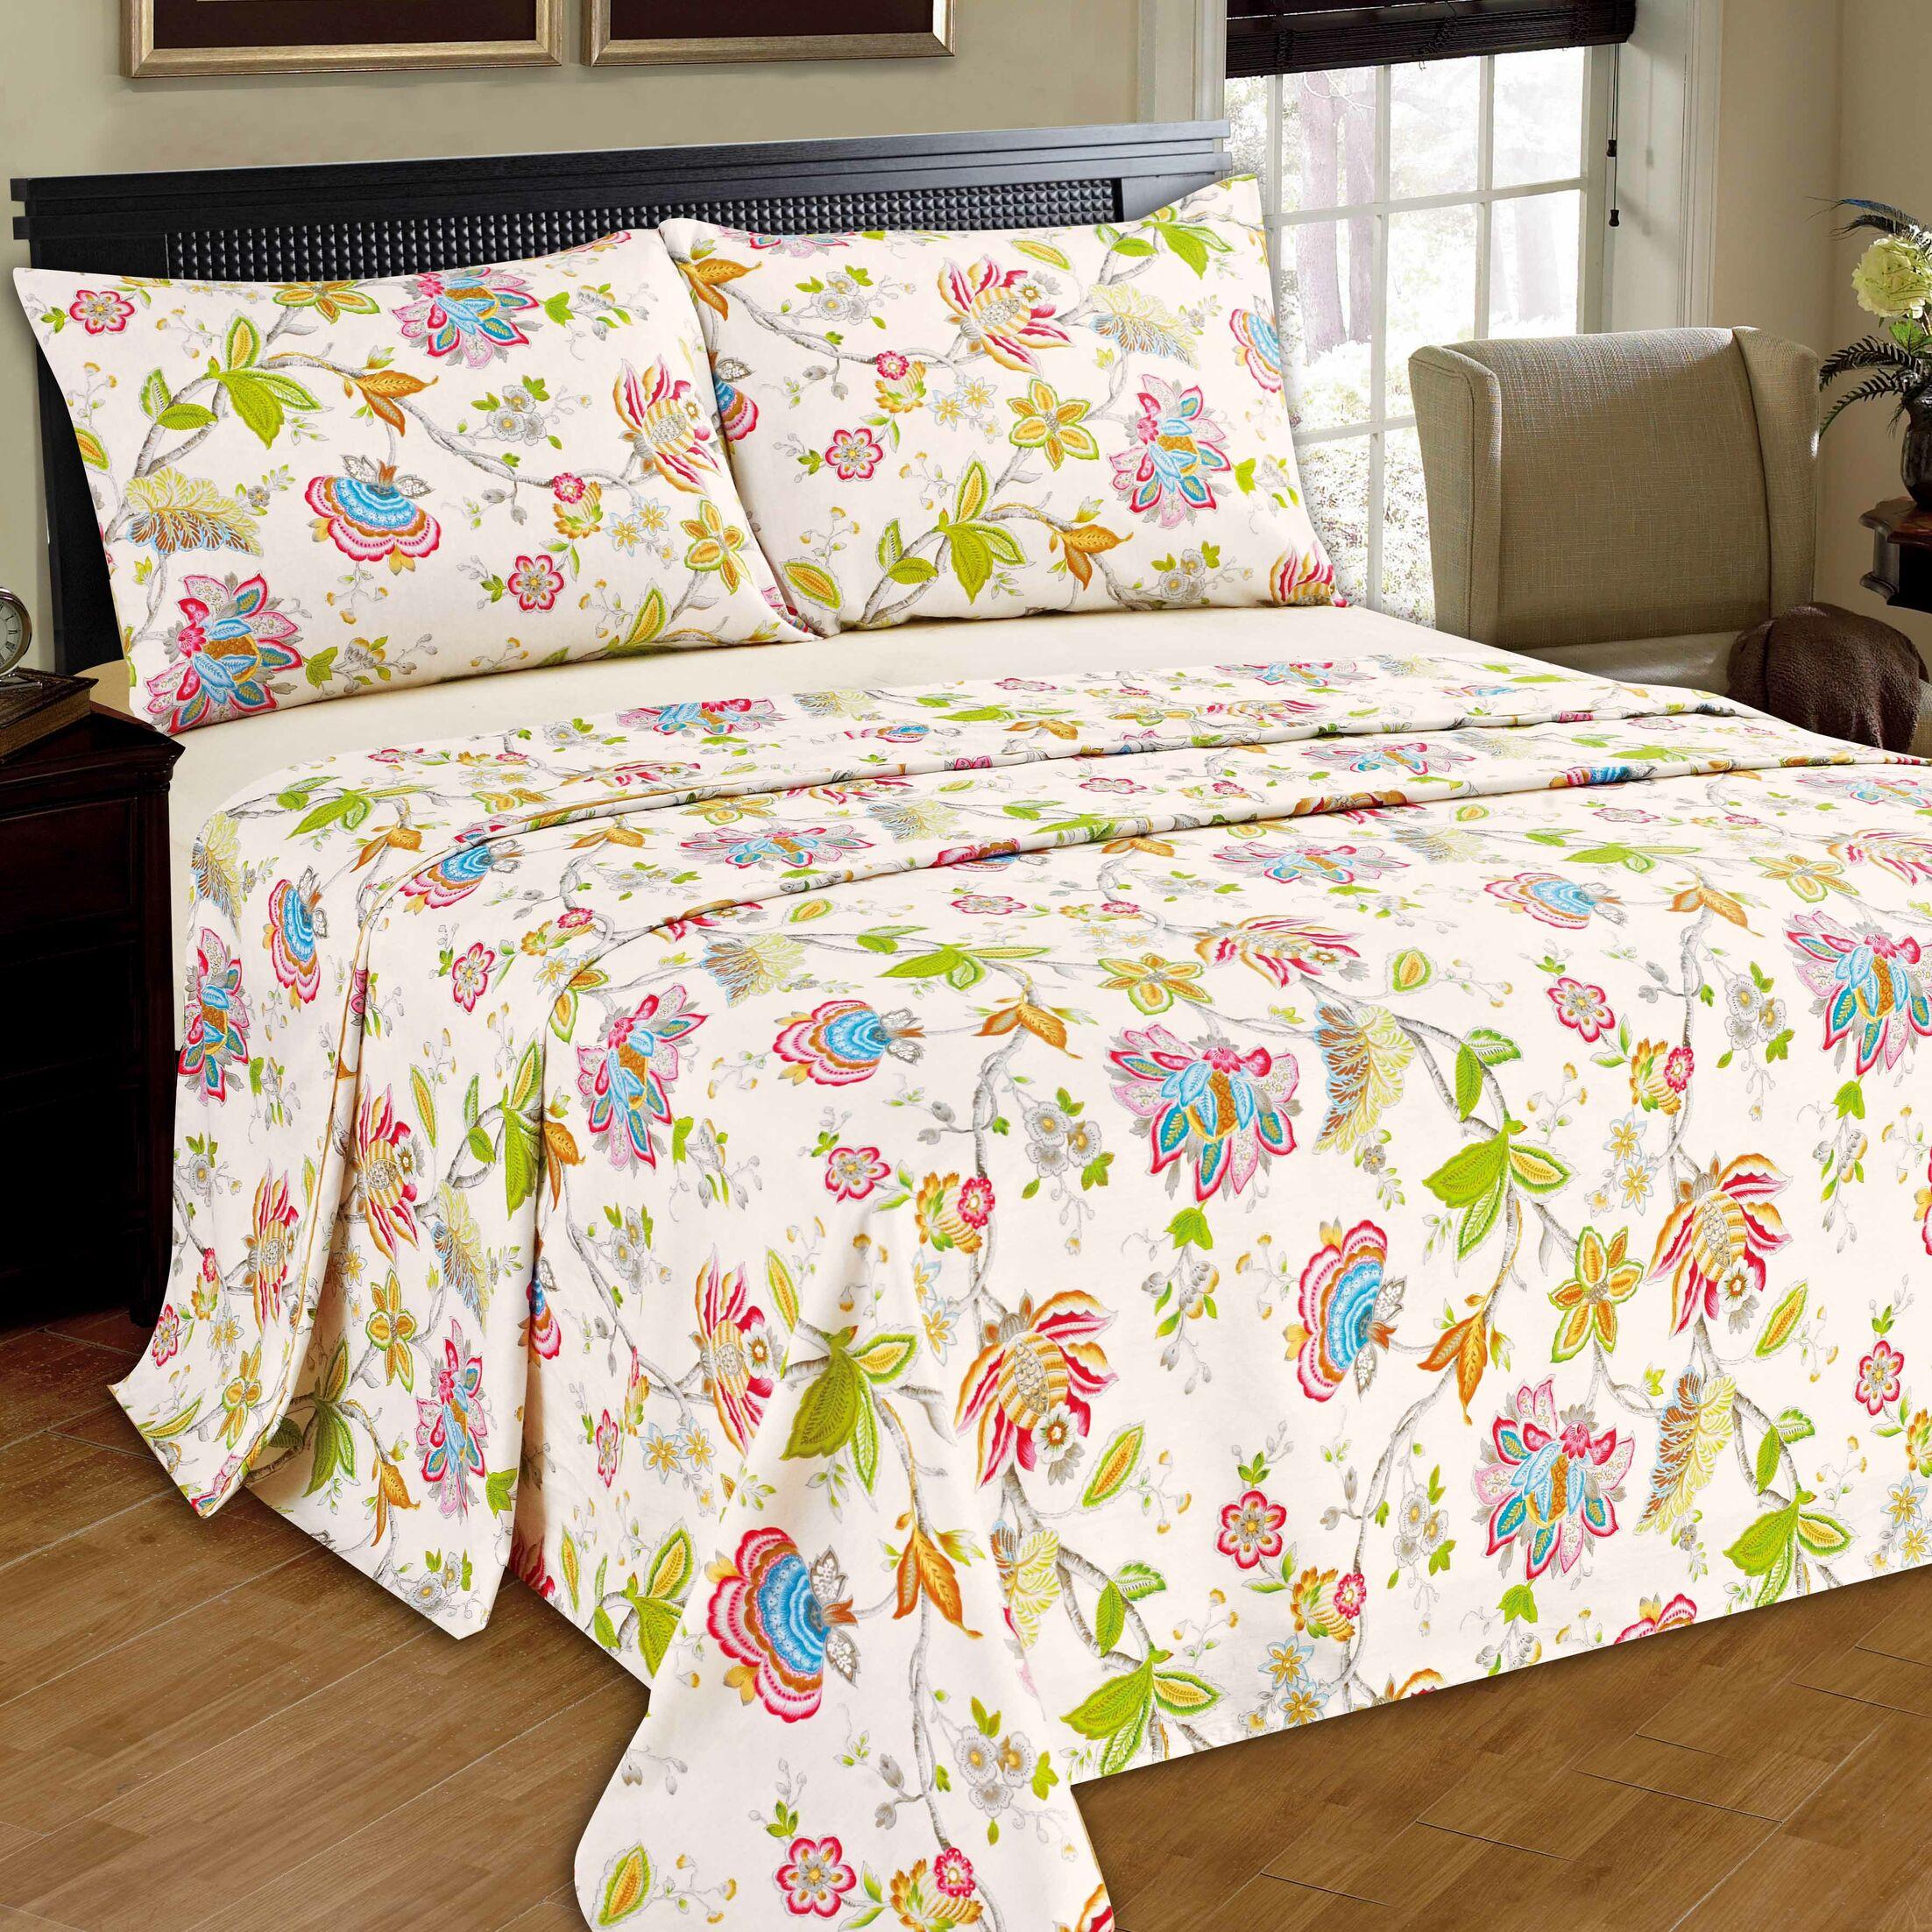 Sprague-Story 100% Cotton Flat Sheet Set Size: King